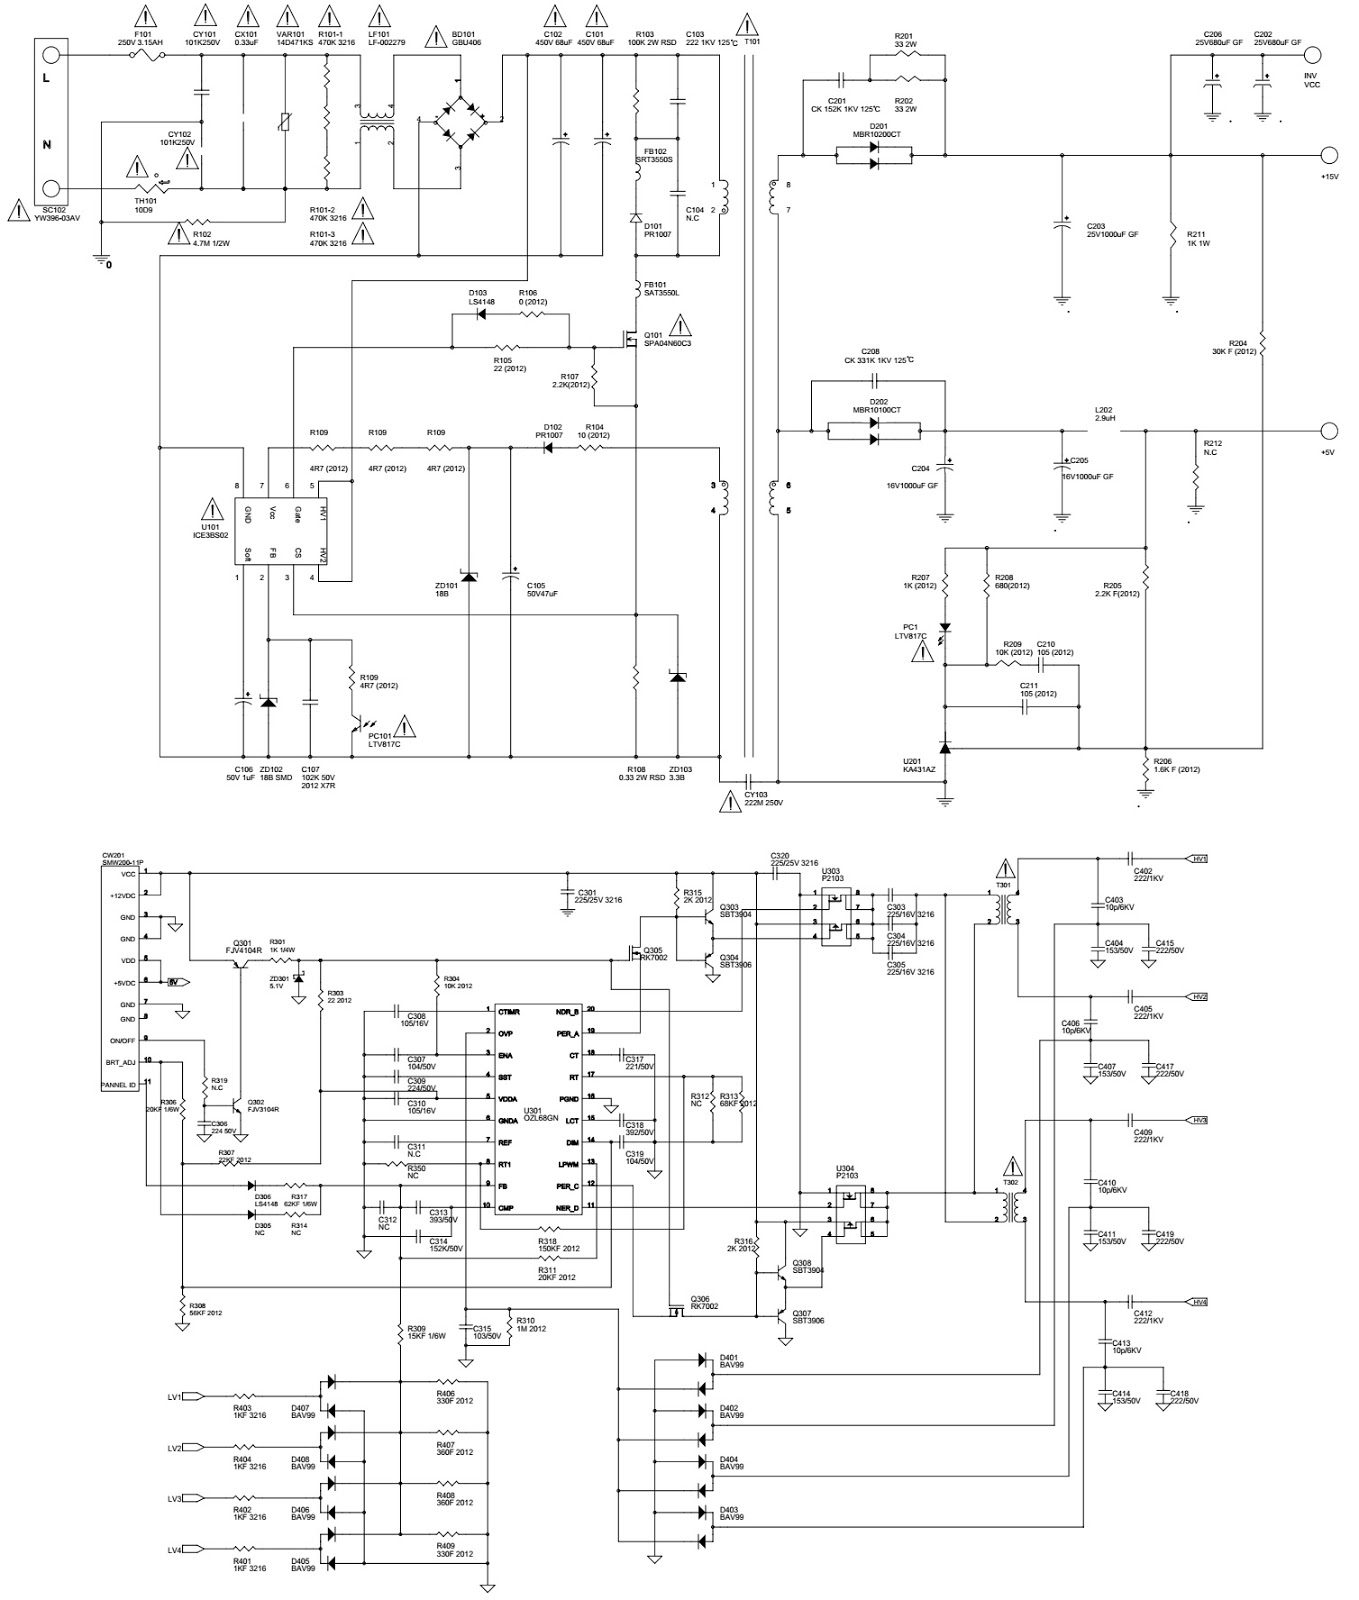 electro help 05 05 16 rh electronicshelponline blogspot com